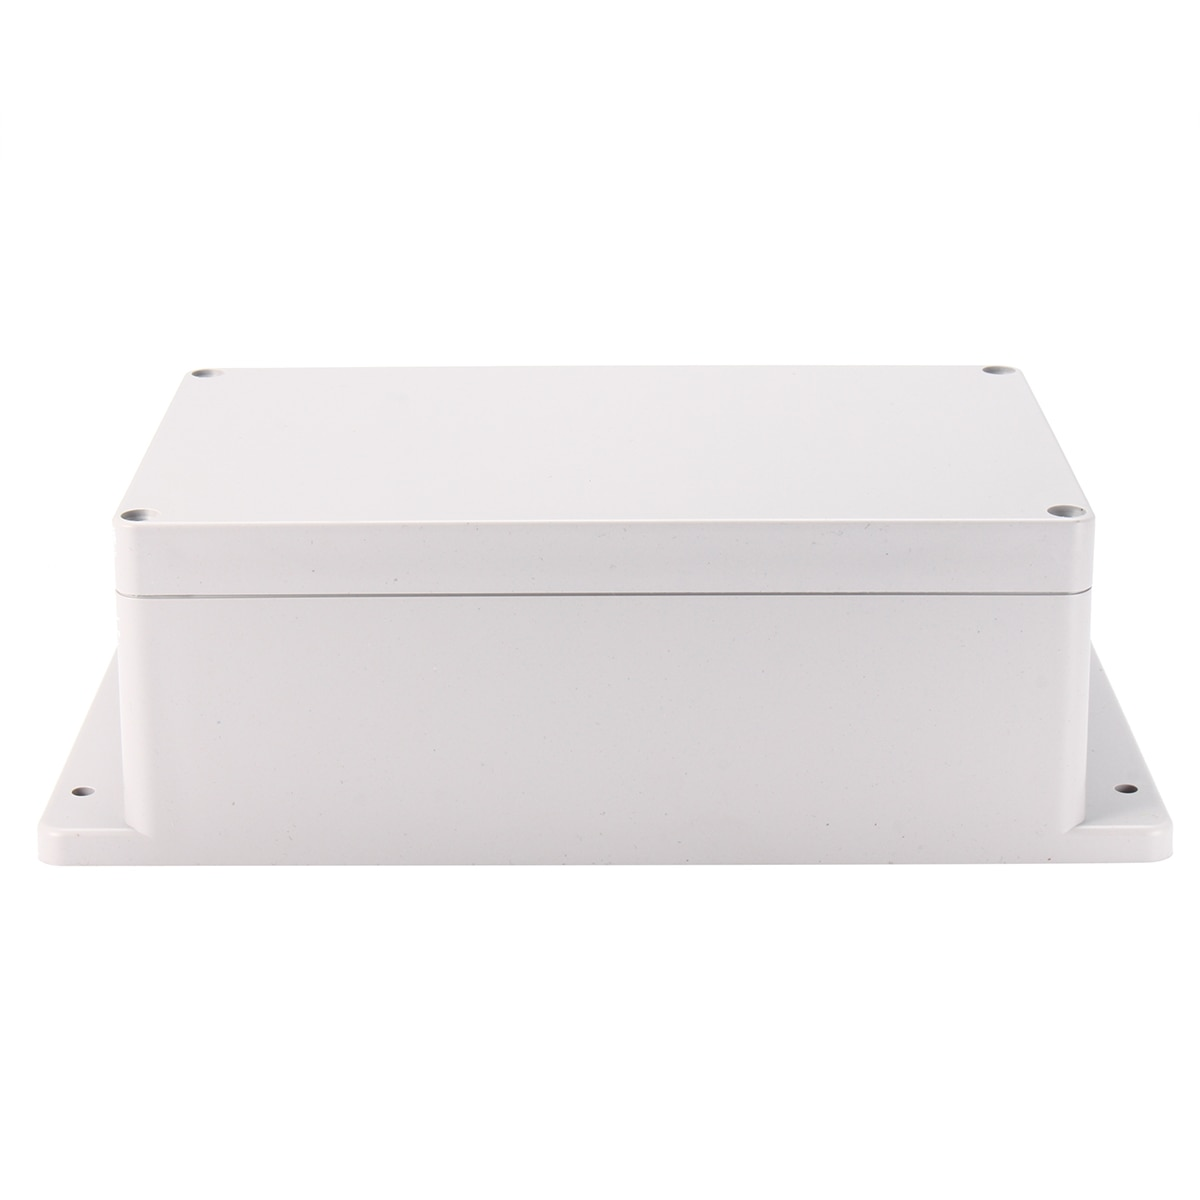 ABS impermeable carcasa caja de instrumentos de proyecto electrónico proyecto eléctrico caja de empalmes para exteriores vivienda 240x120x75mm